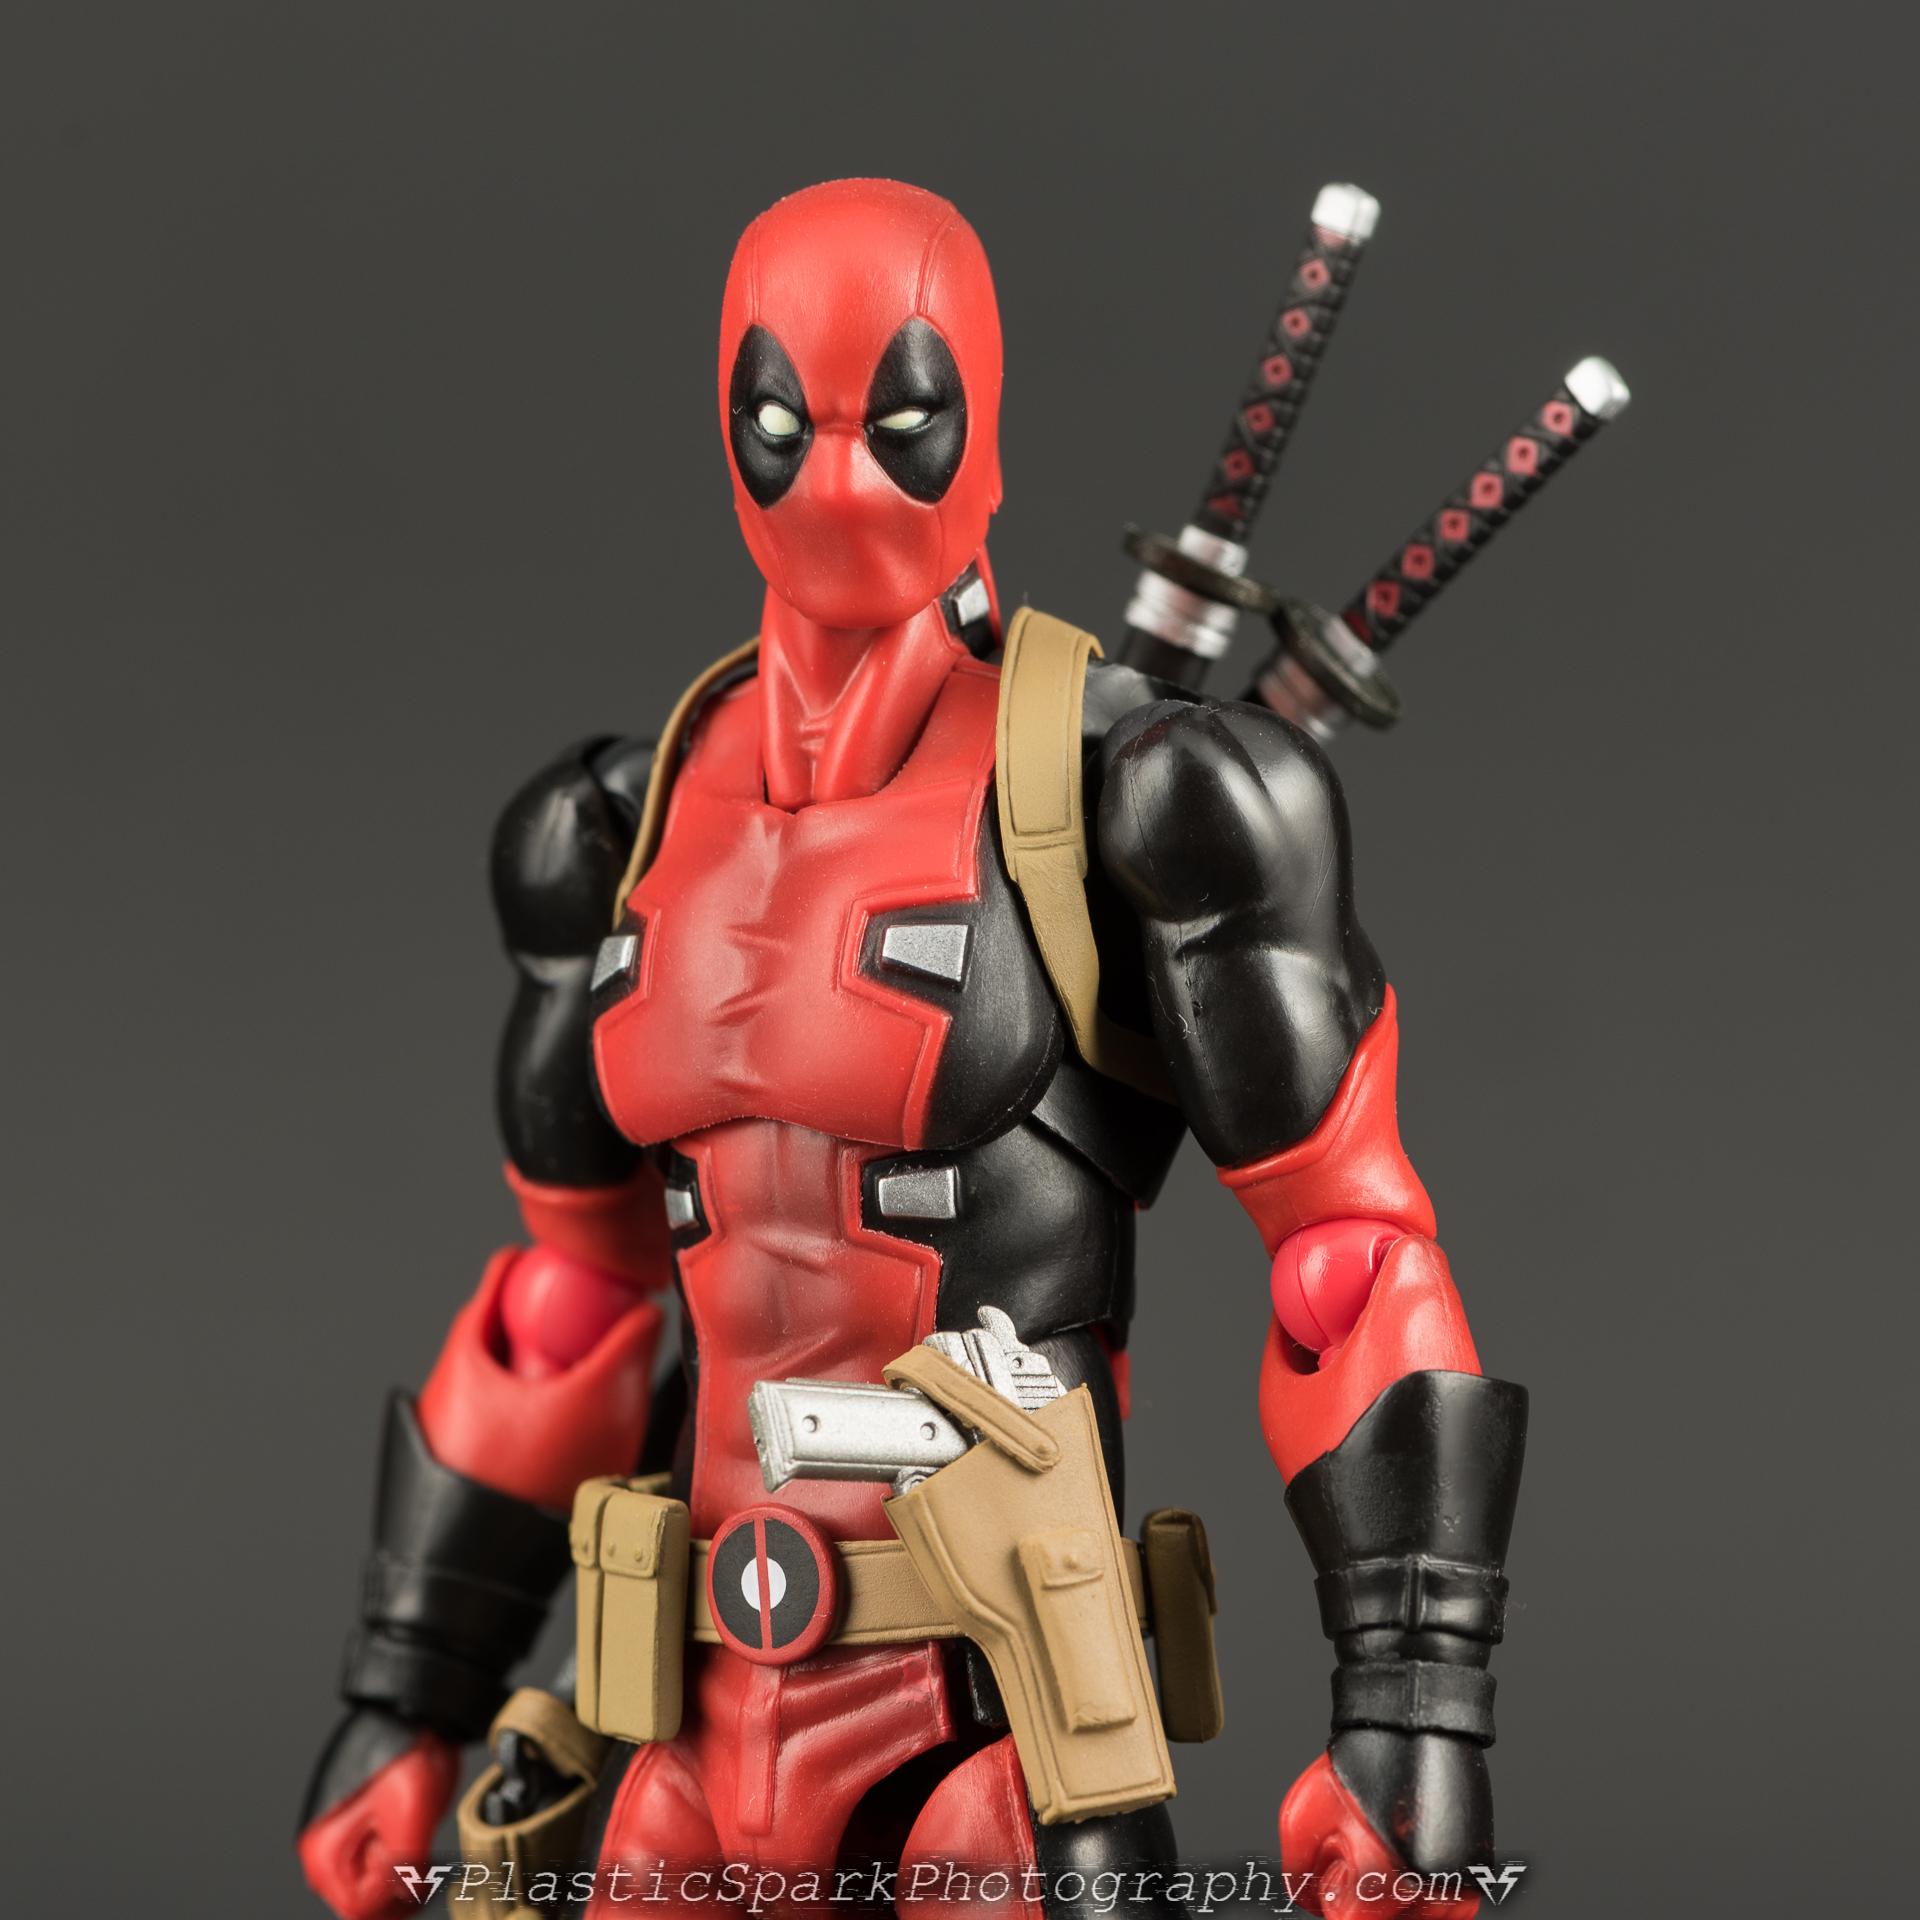 Figma-Deadpool-(2-of-62).jpg